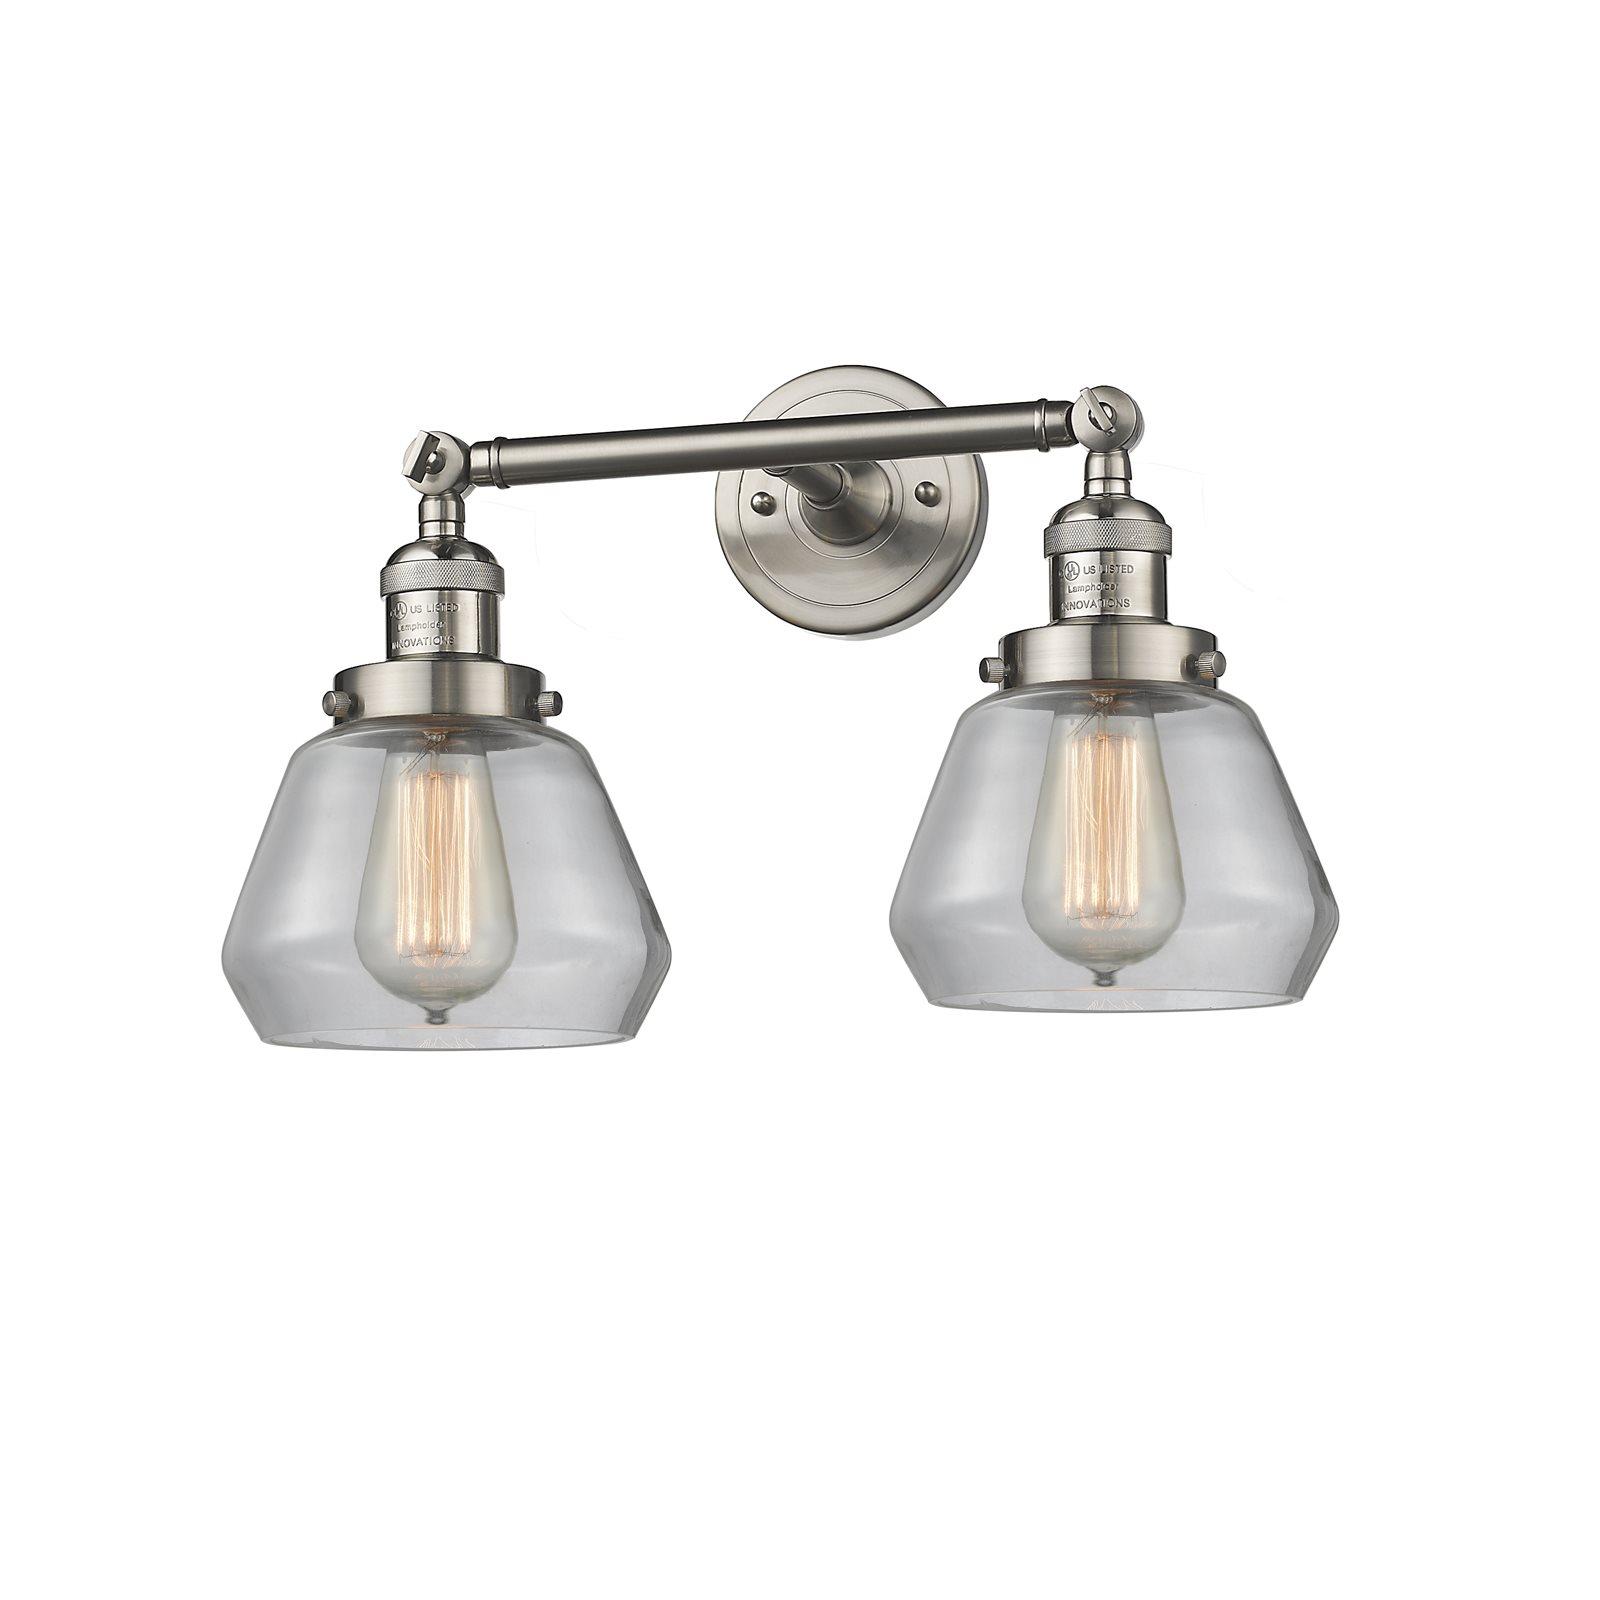 "Innovations 2-LT LED Fulton 16.5"" Bathroom Fixture Brushed Satin Nickel 208-SN-G172-LED by"